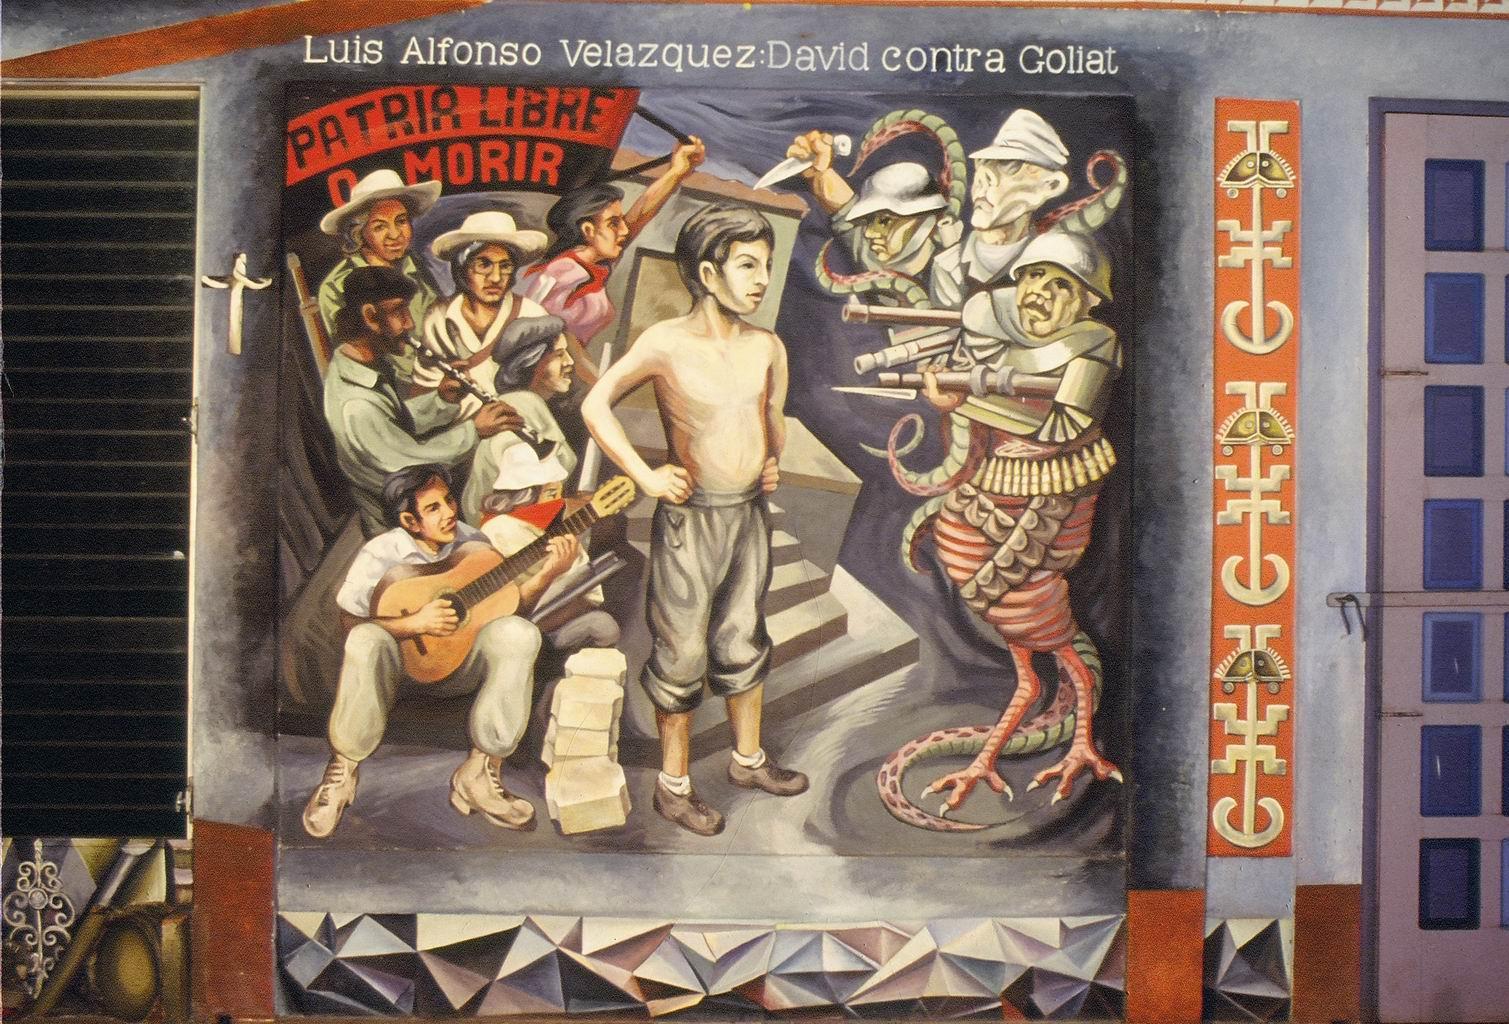 1982-1985-1n-luis-alfonso-velasquez-affronta-la-grande-bestiachiesa-del-barrio-riguero-managua